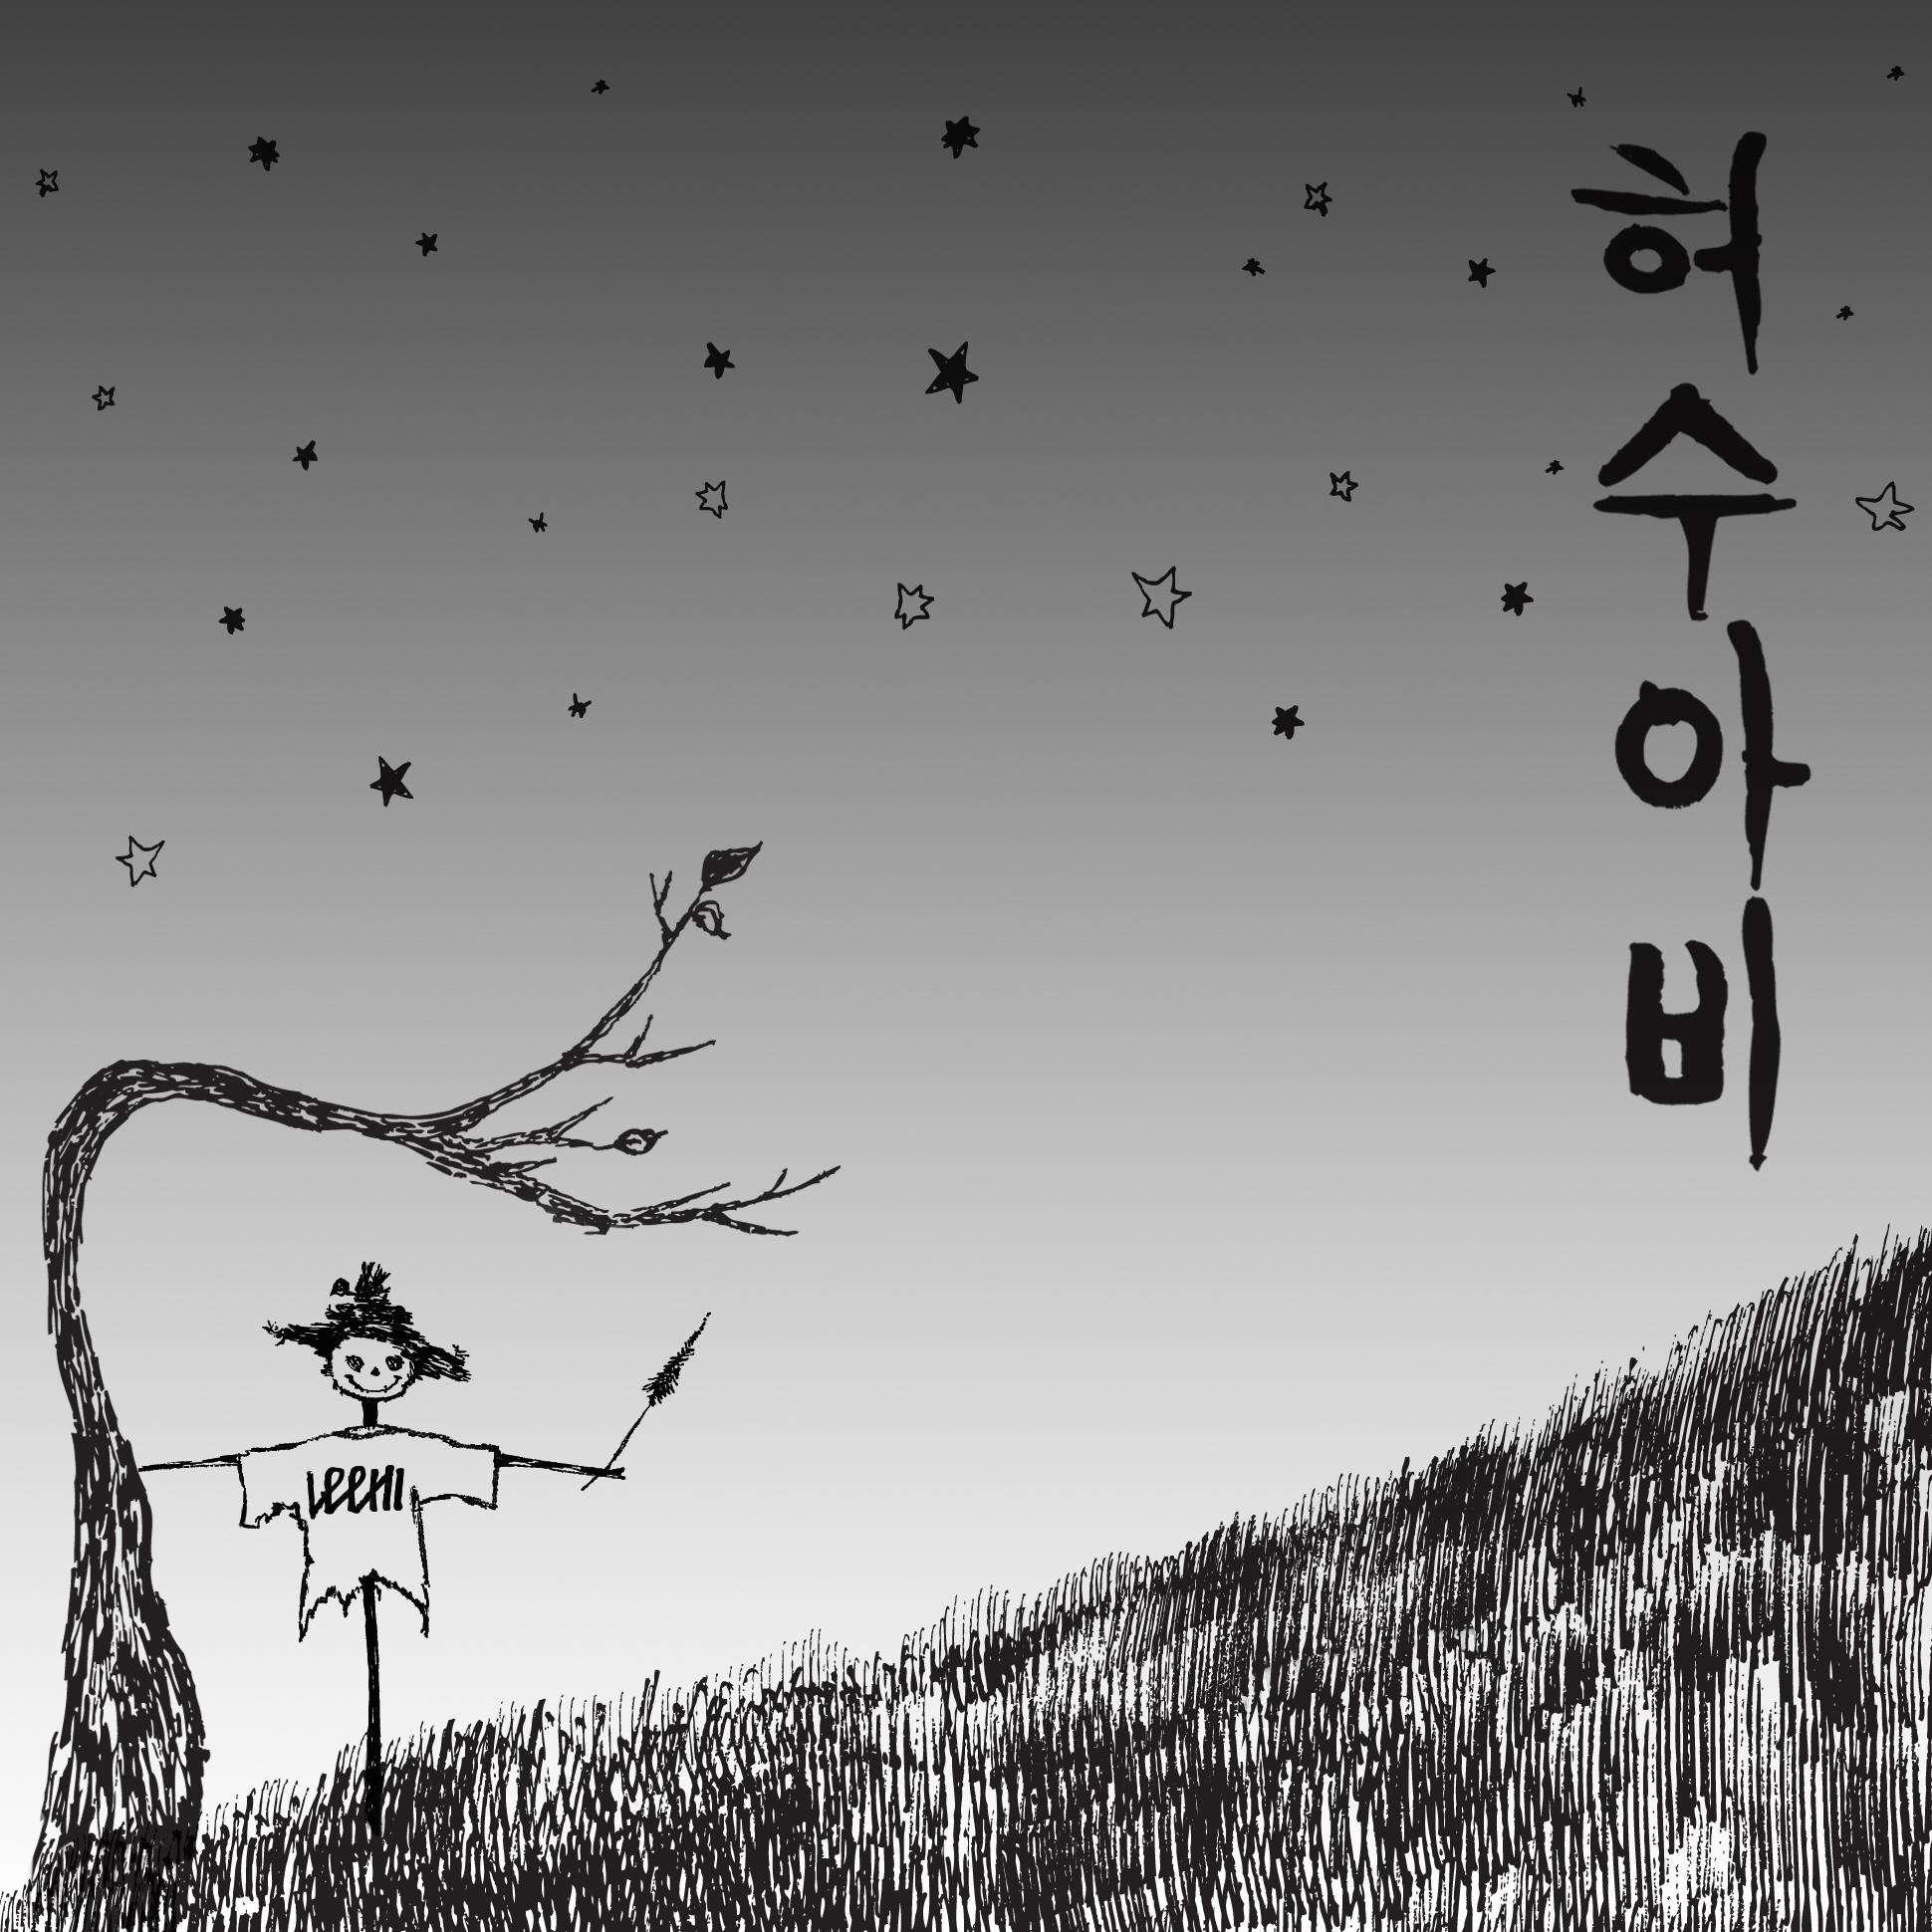 [Single] Lee Hi - SCARECROW